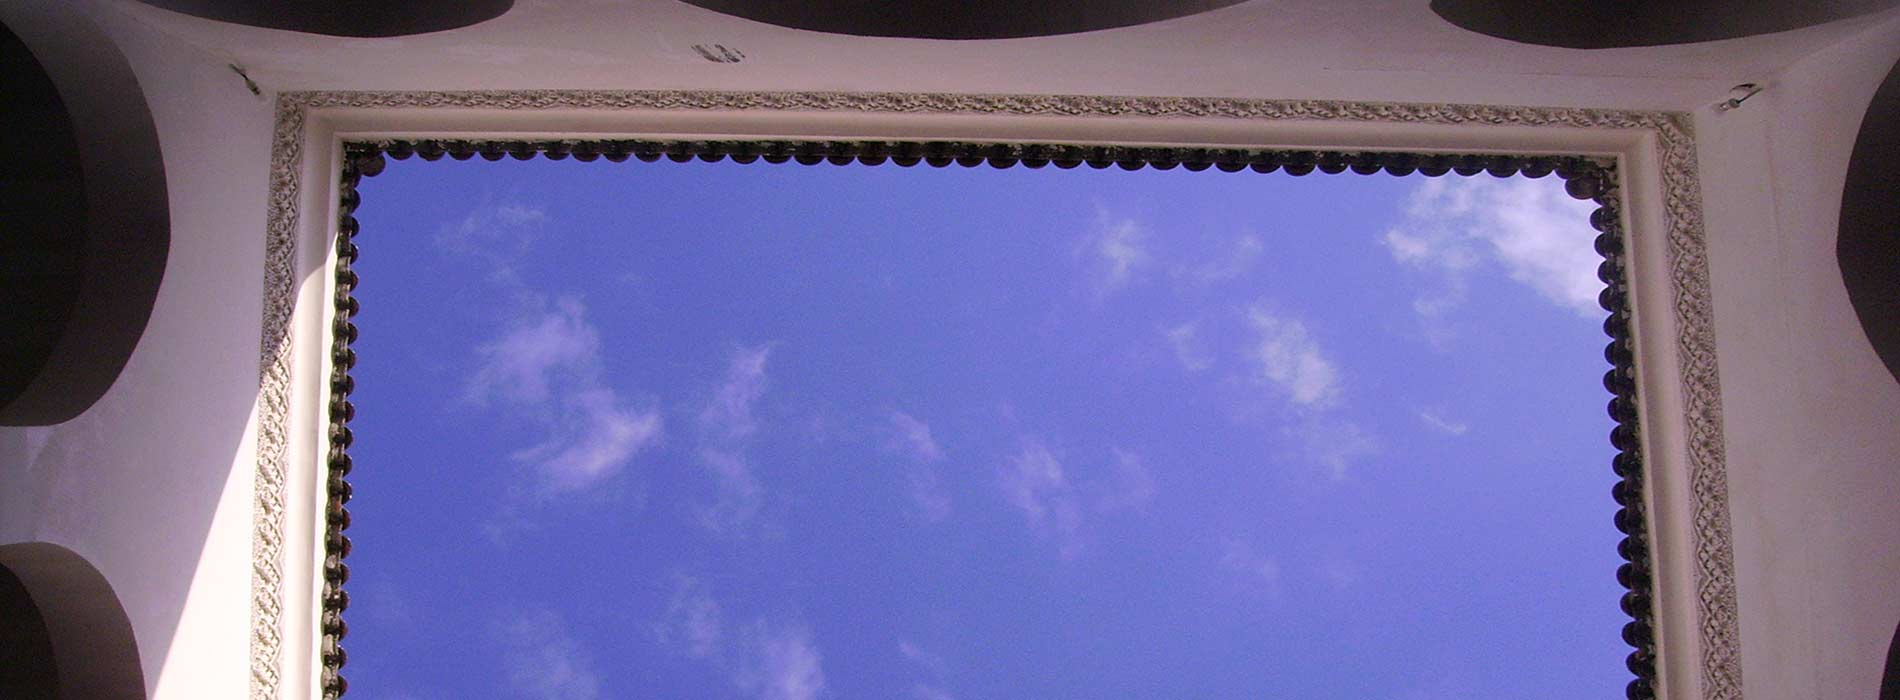 Riad Aguaviva patio. Sky. Riad Hotel in Marrakech medina.